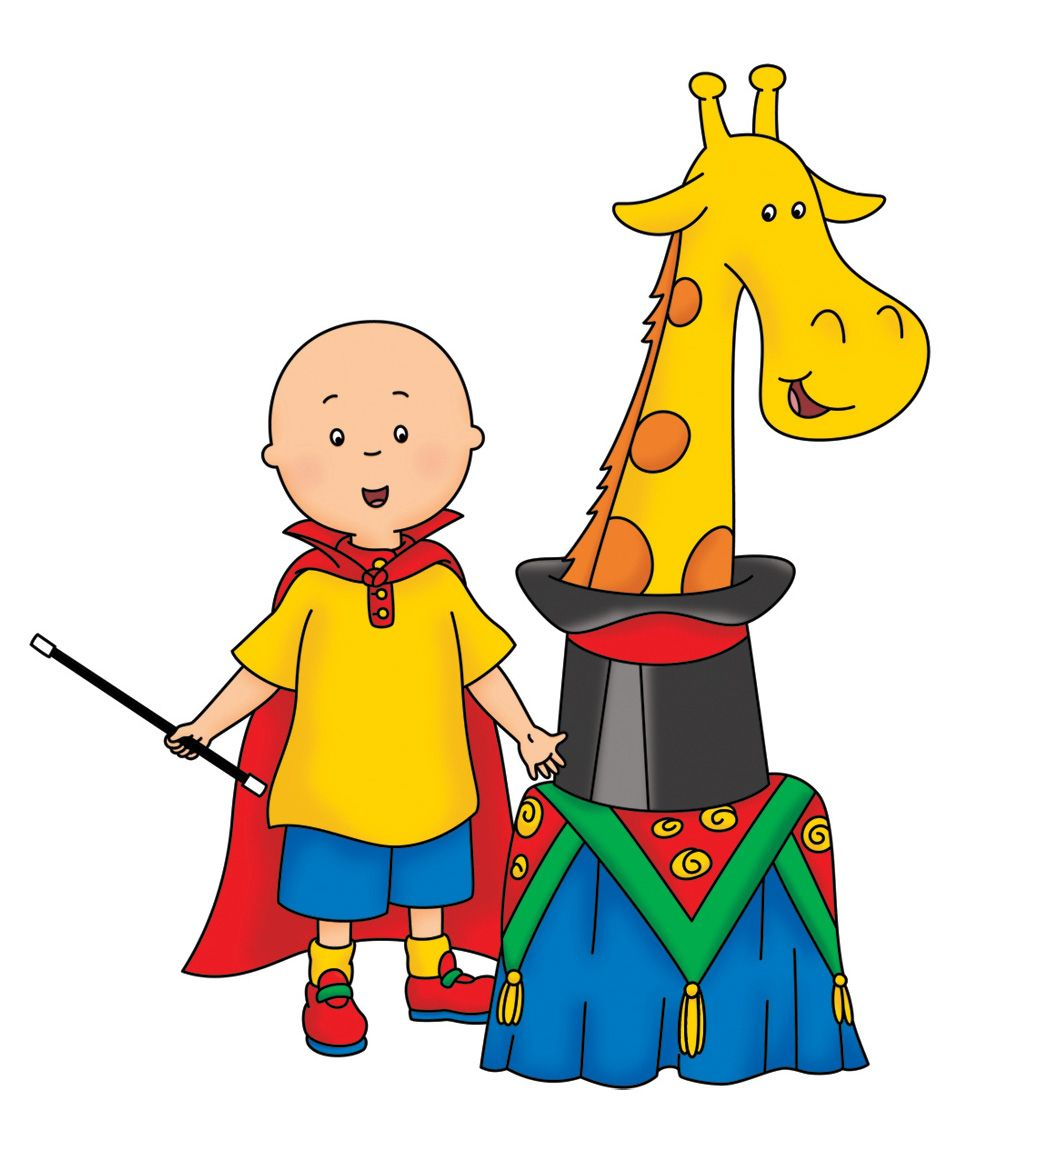 Goochelaar | lillys child hood | Pinterest | Caillou and Pbs kids